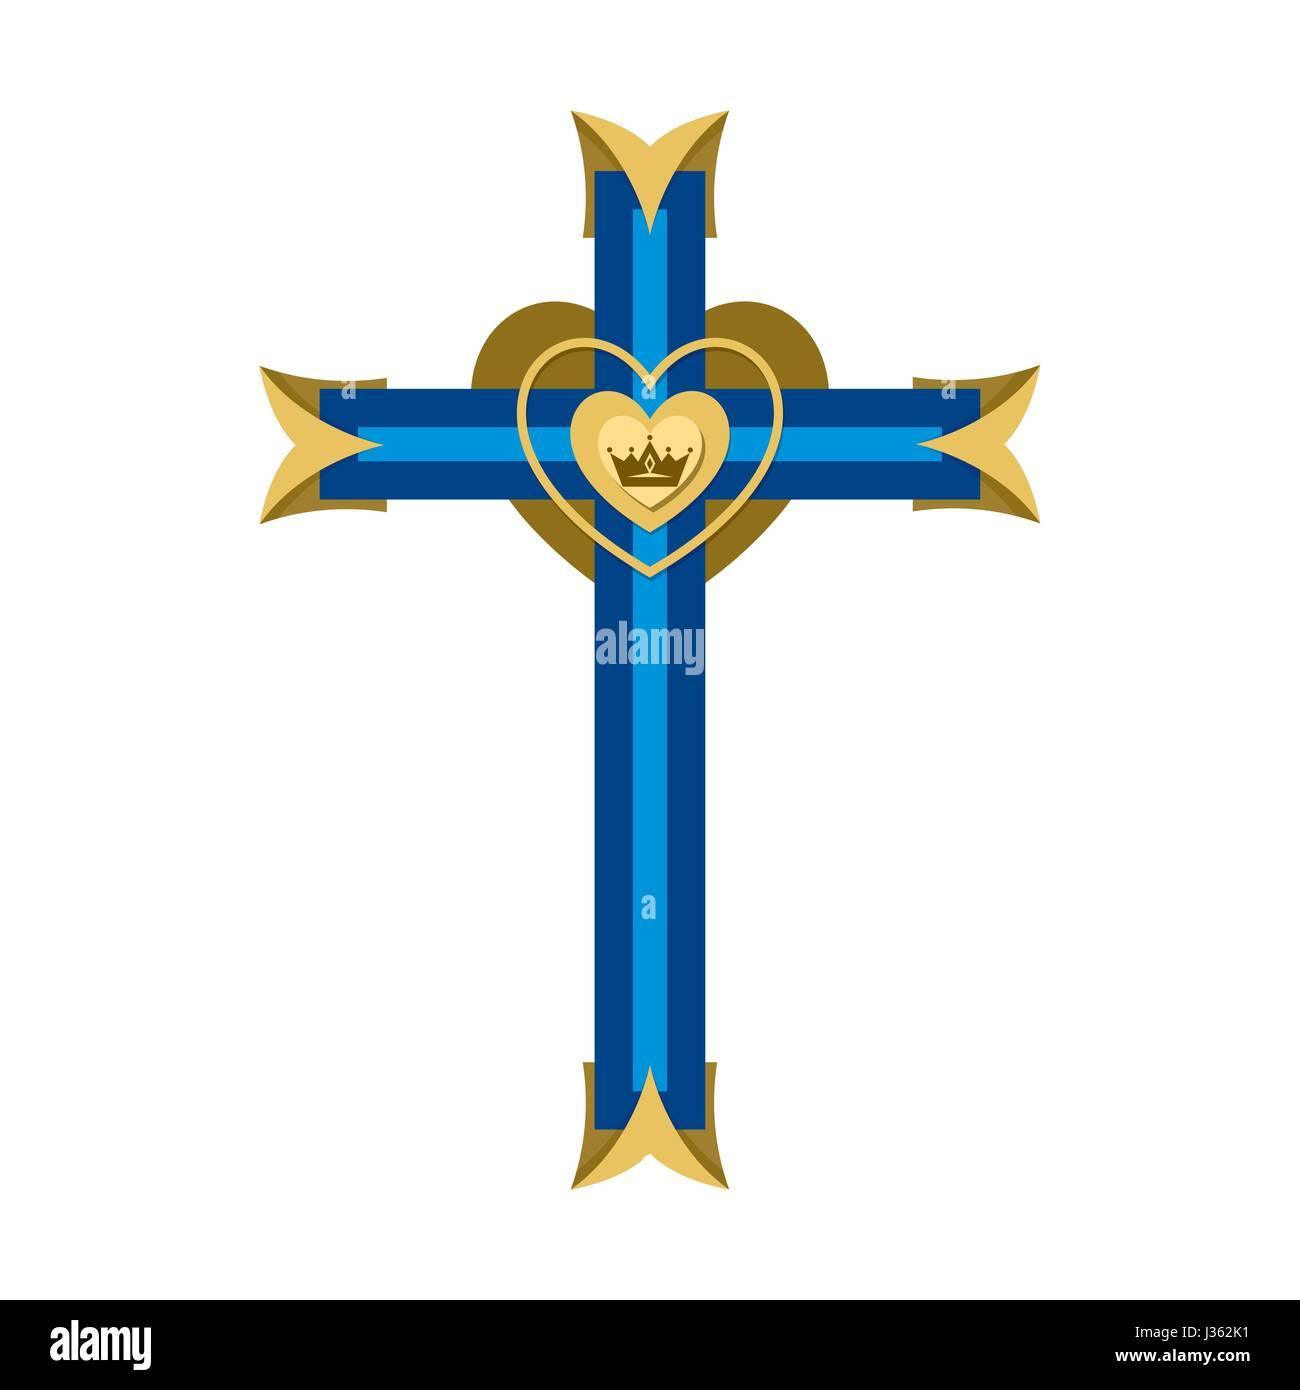 Christian Symbol Cross Of The Lord And Savior Jesus Christ Stock